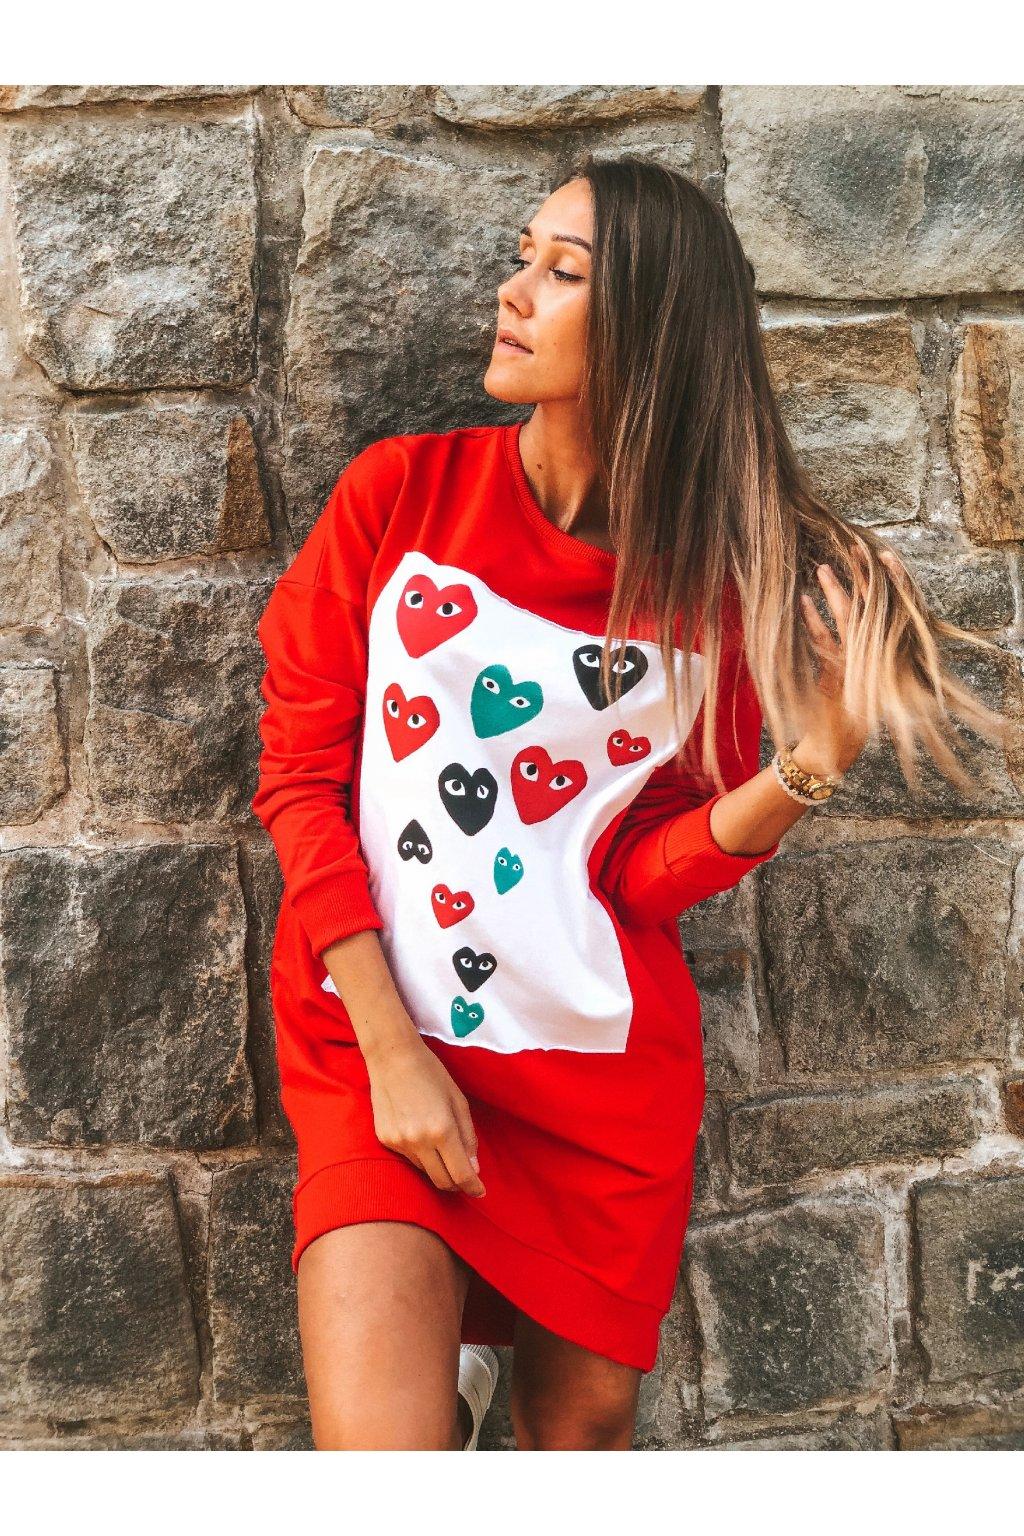 damska prodlouzena mikina hearts red eshopat cz 1